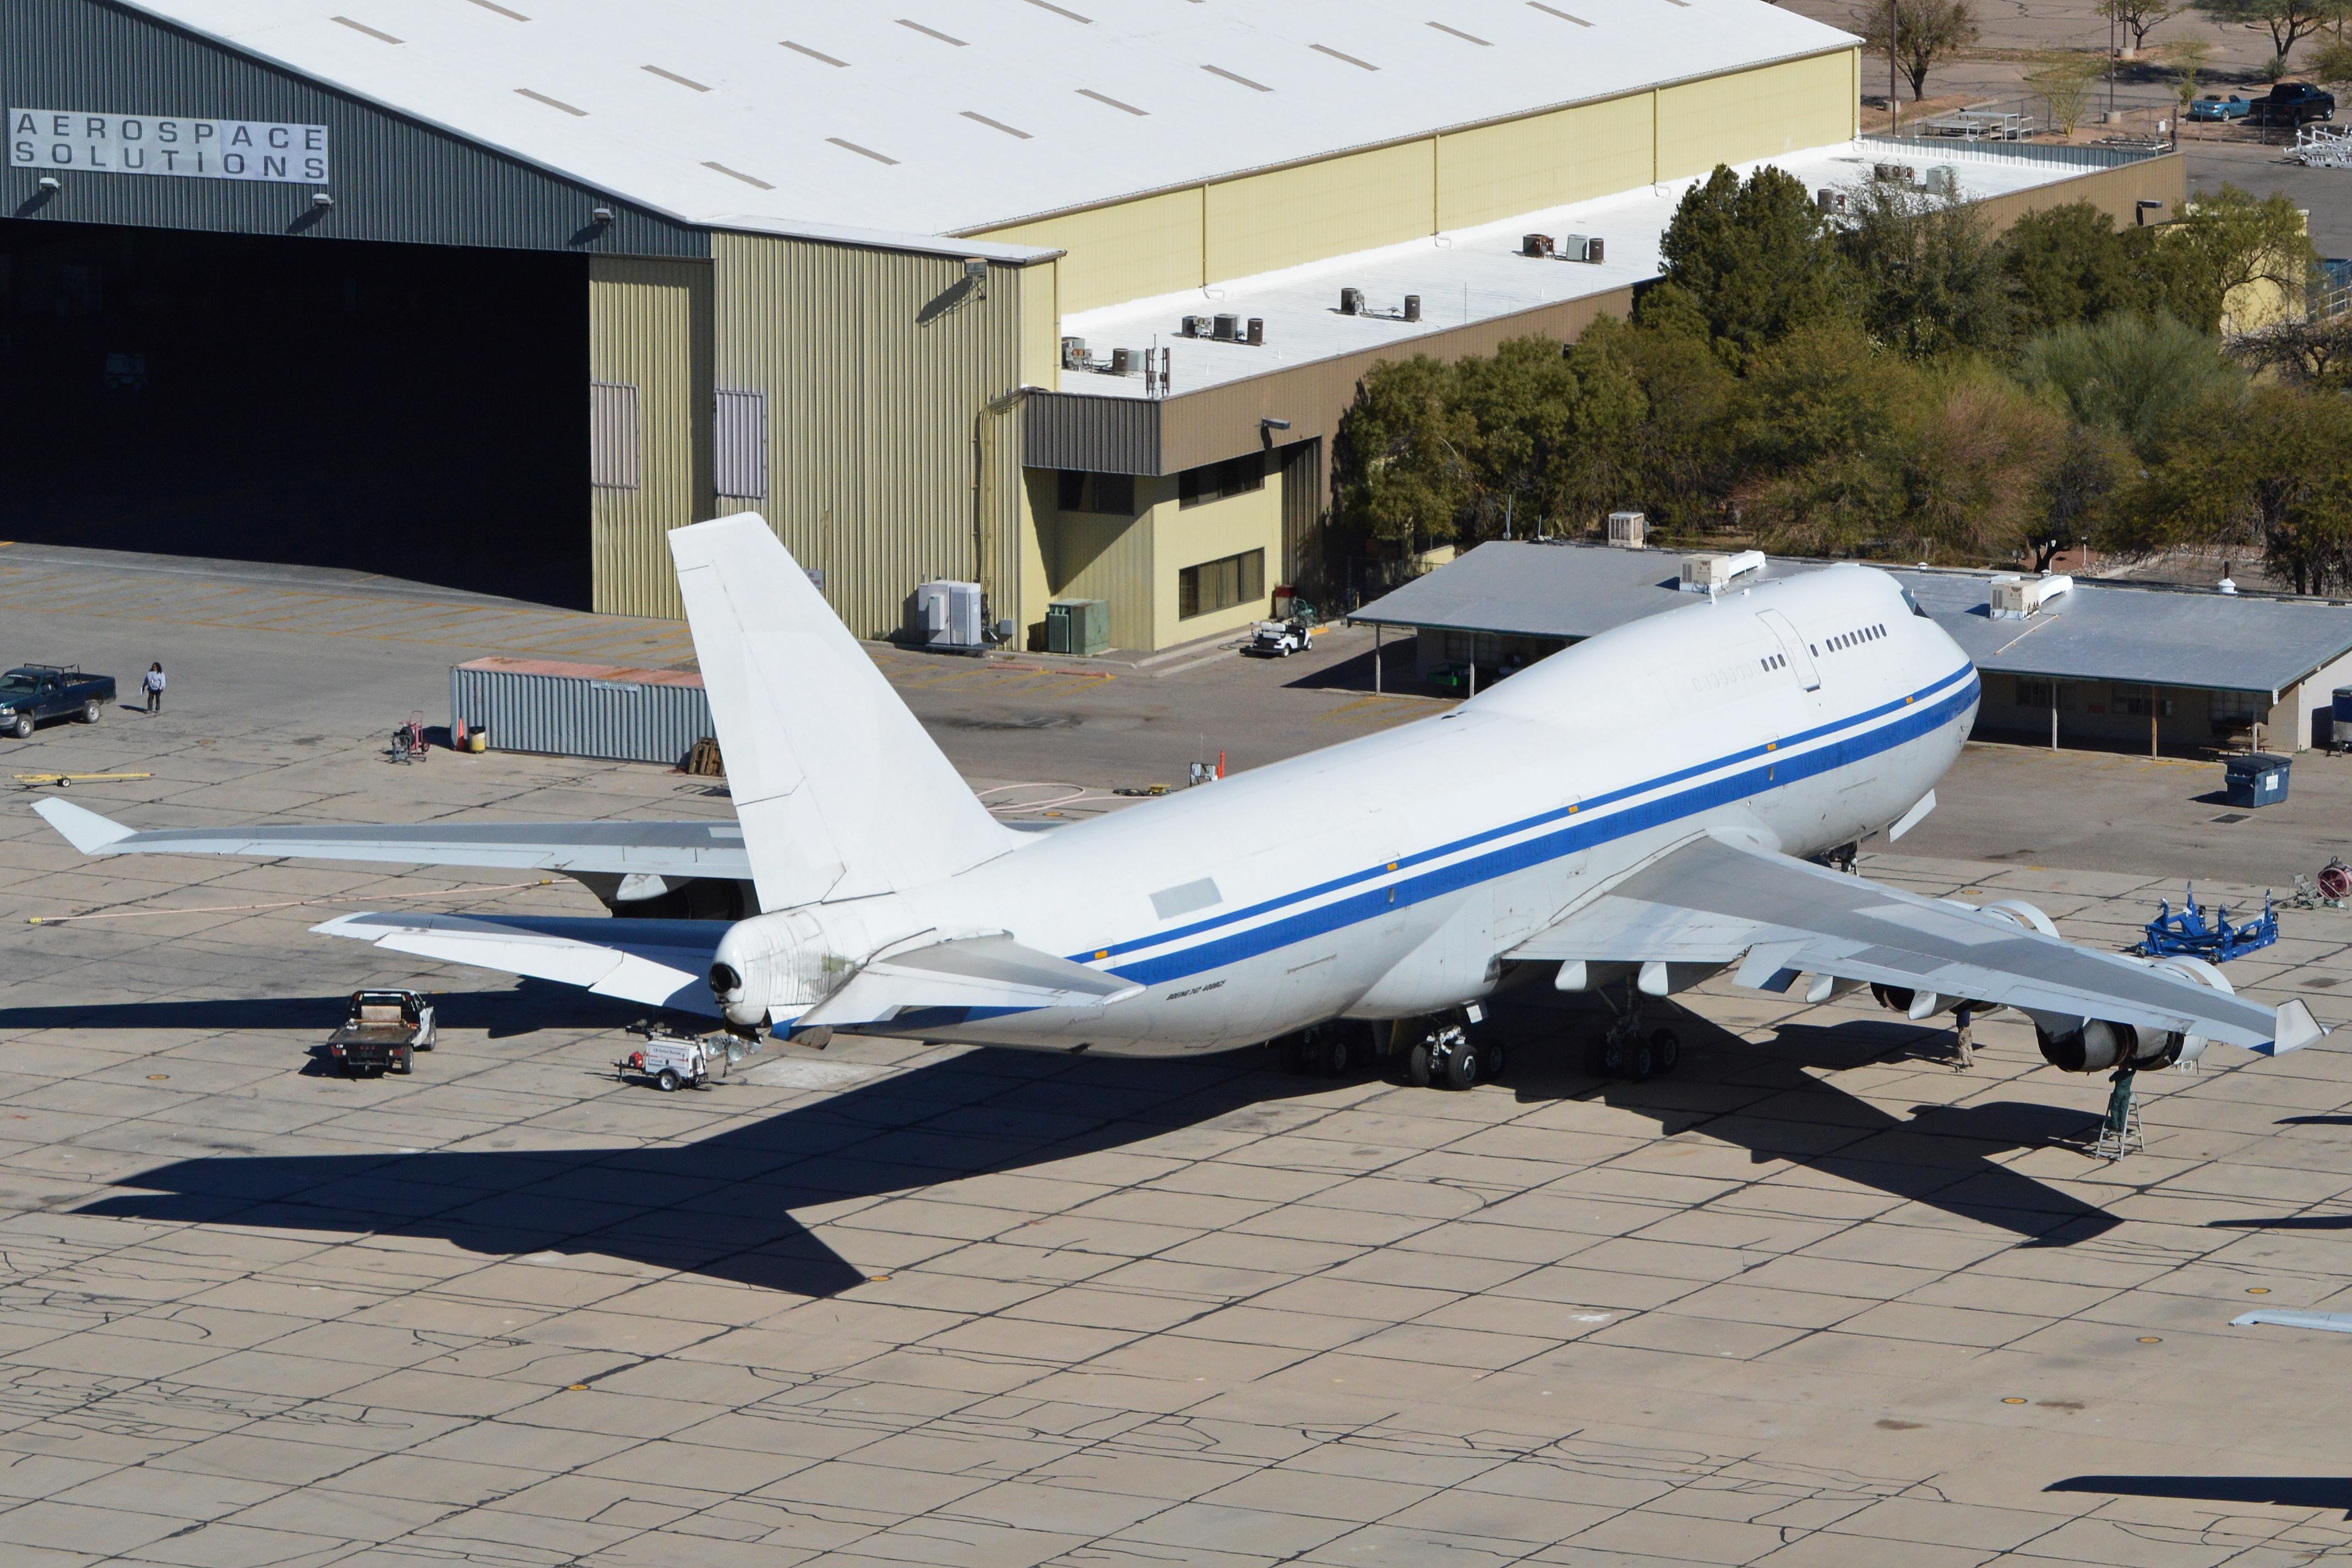 File:Boeing 747-4J6 SCD (B-2456) (13625250043).